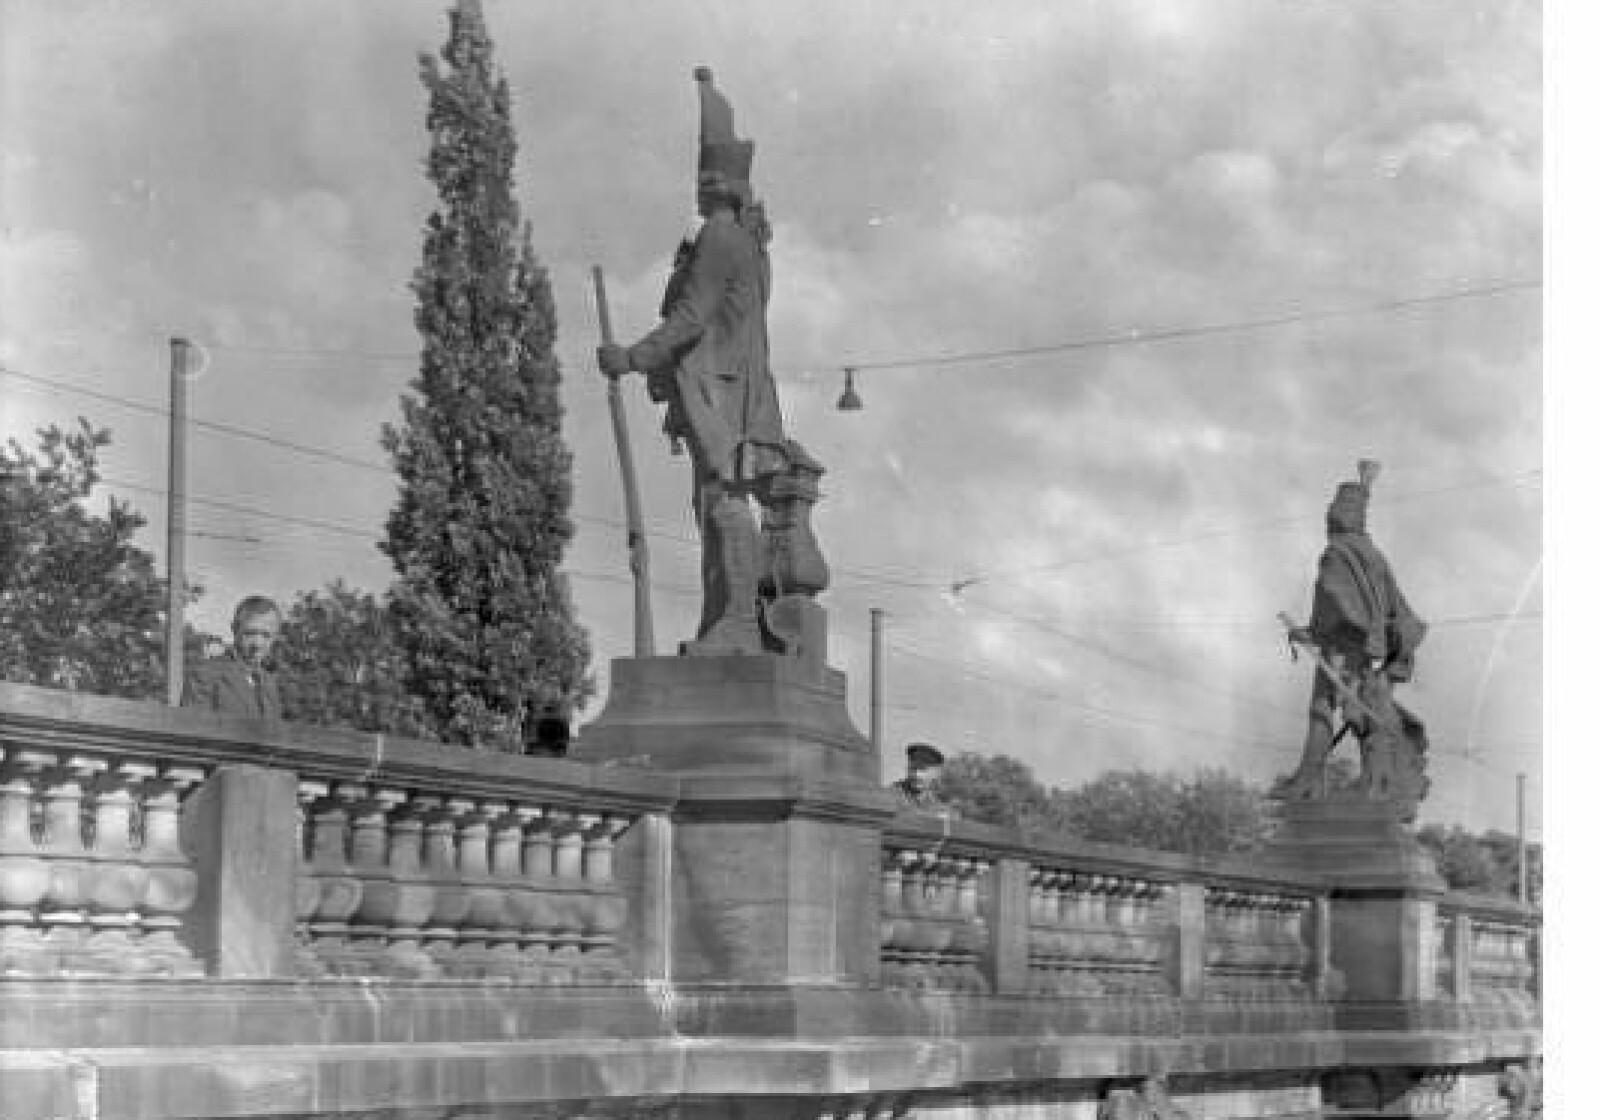 <b>1928:</b> Fra 1895 prydet Jonas og tre andre «Langen Kerls»-soldater Lange Brücke i Potsdam. Her stod de helt til britens voldsomme bombeangrep natten til 14. - 15. april 1945 som la Potsdam i grus. Foto: Bundesarchiv